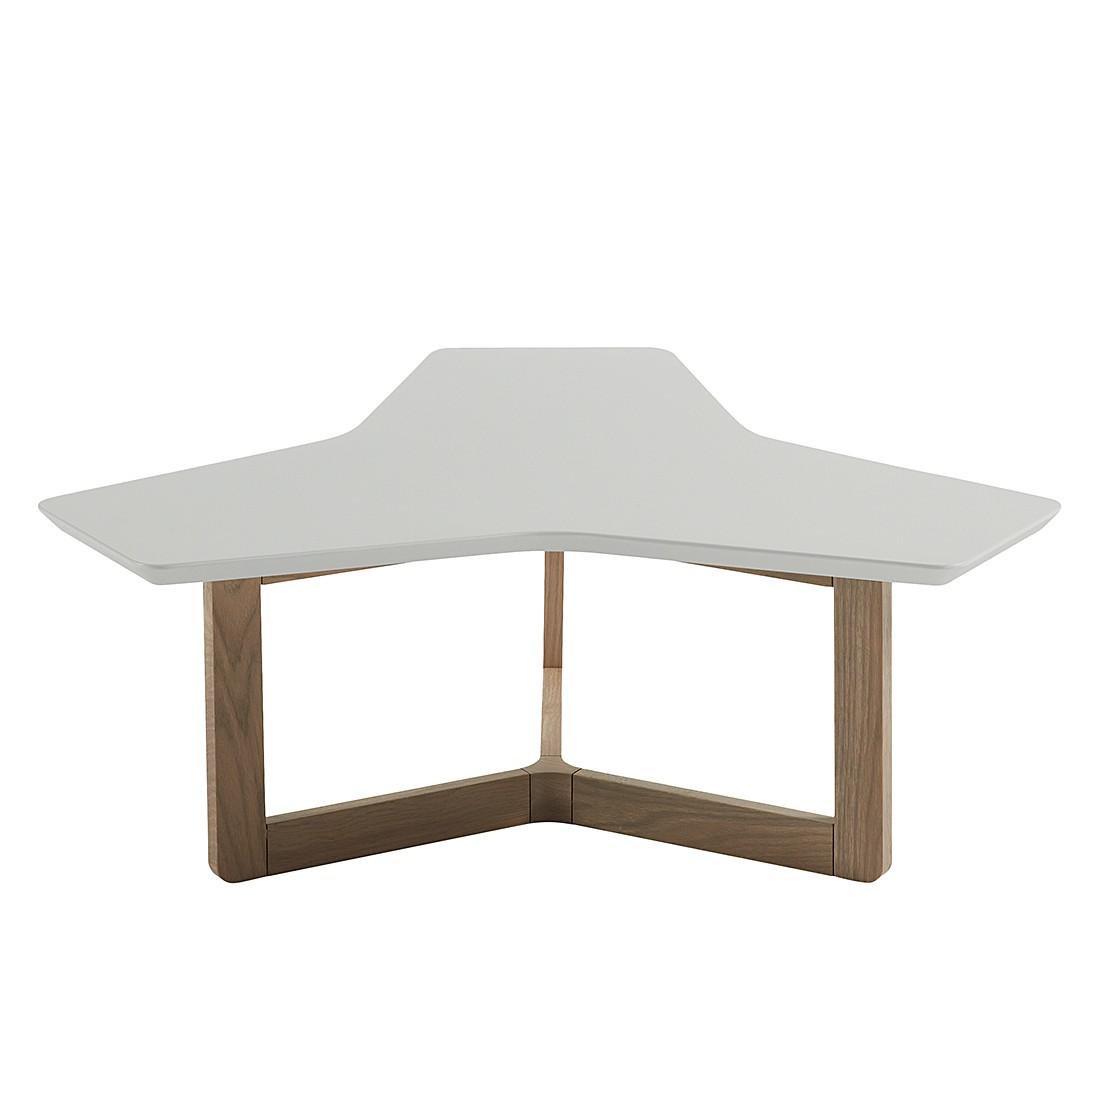 Table basse Larne - Gris clair mat / Chêne, Morteens